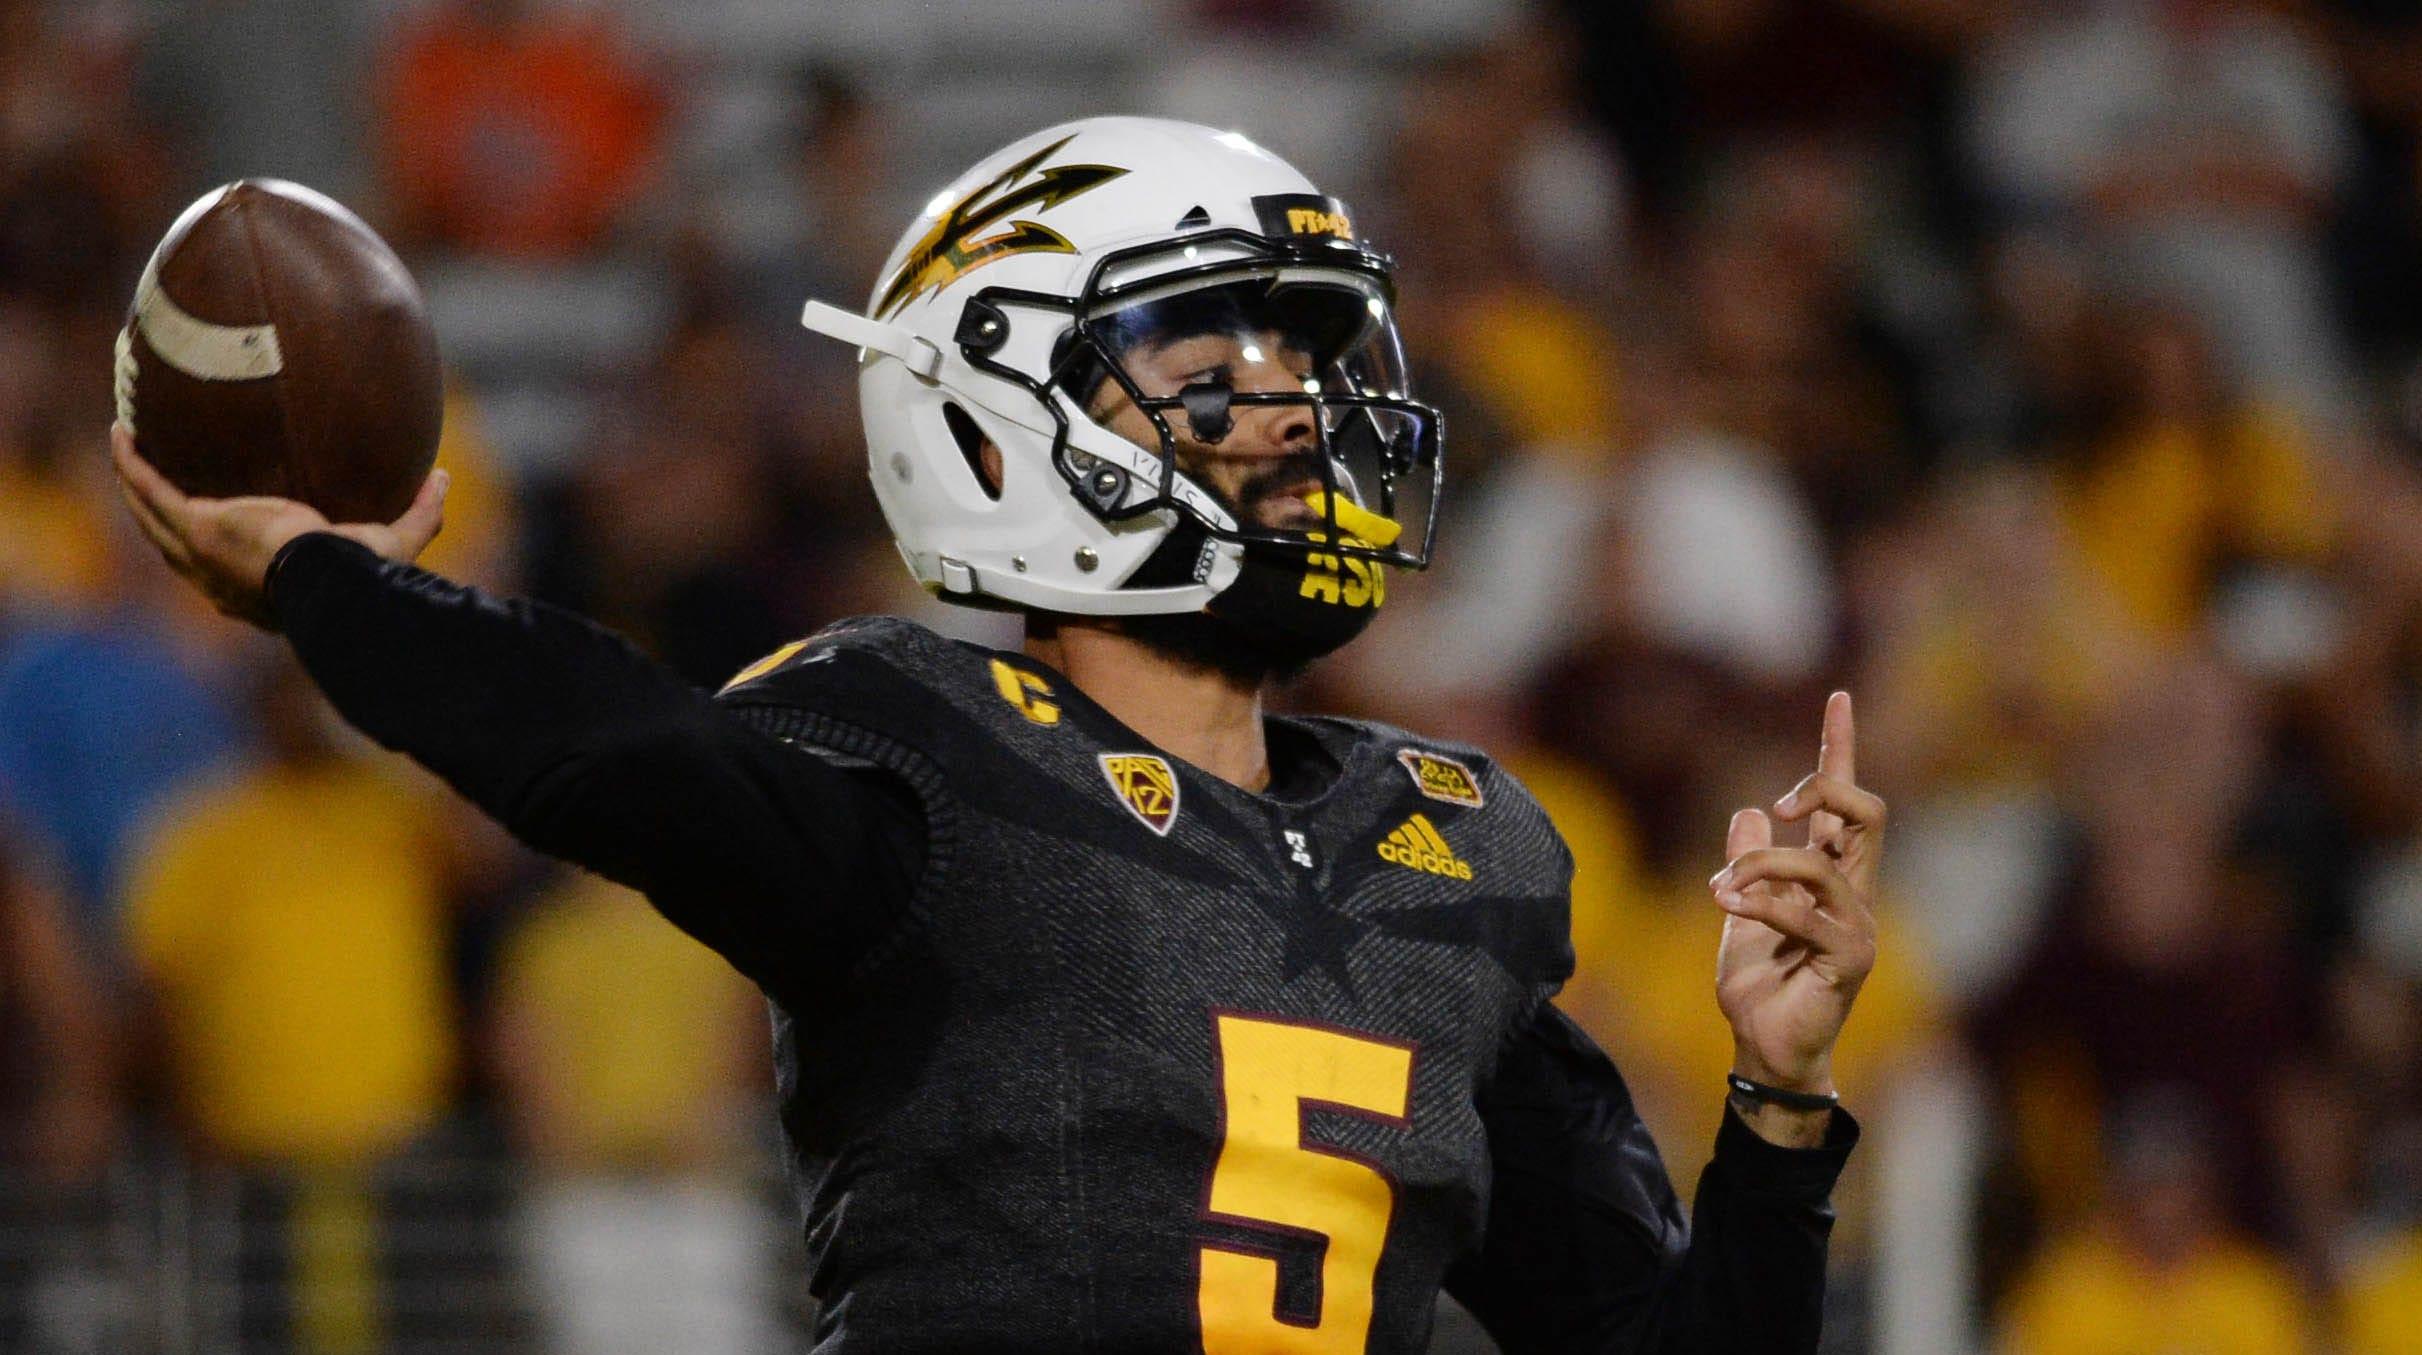 Asu Vs Colorado Picks Predictions For Pac 12 College Football Game